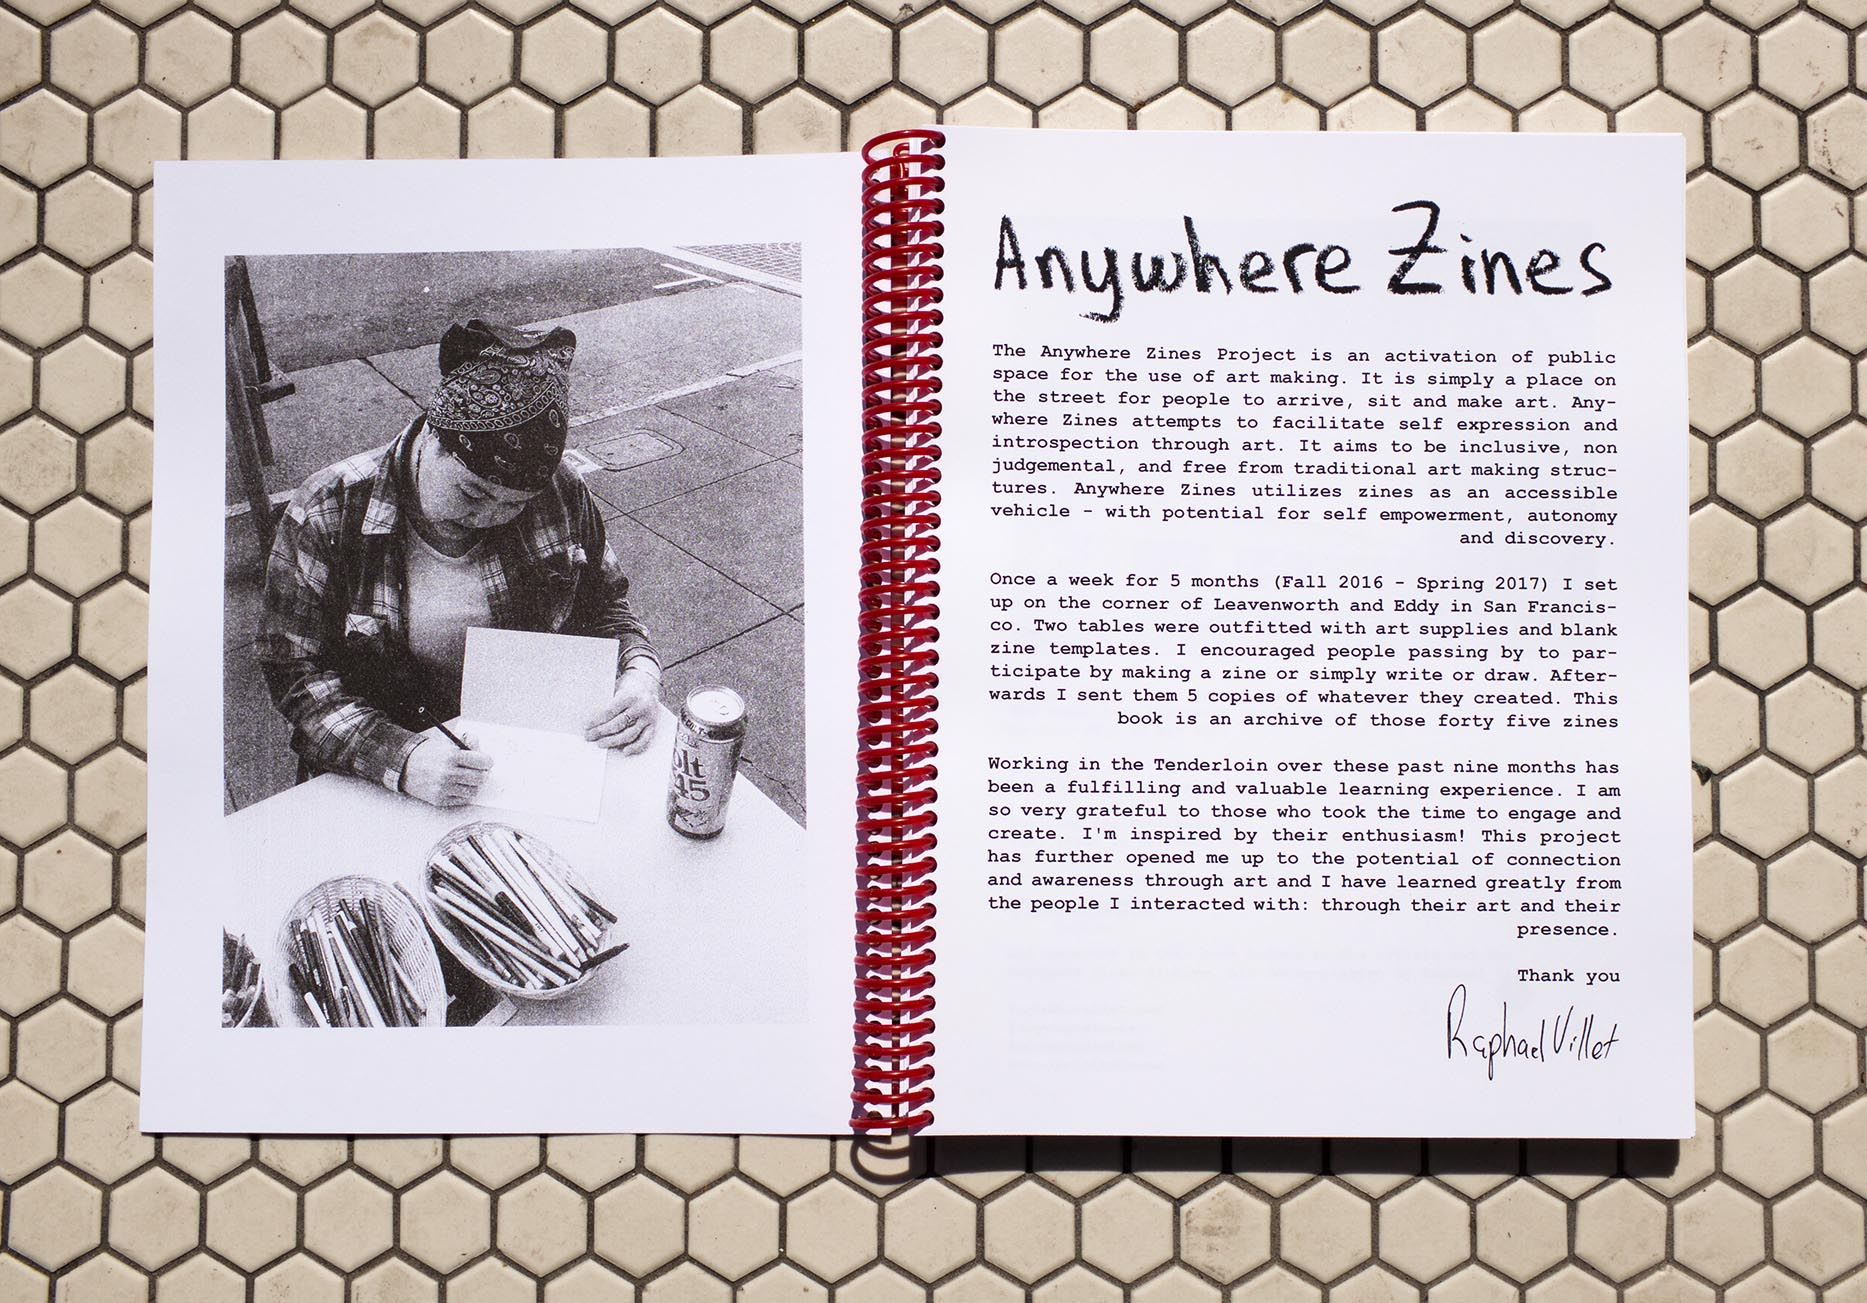 Anywhere Zines in the Tenderloin-02.jpg